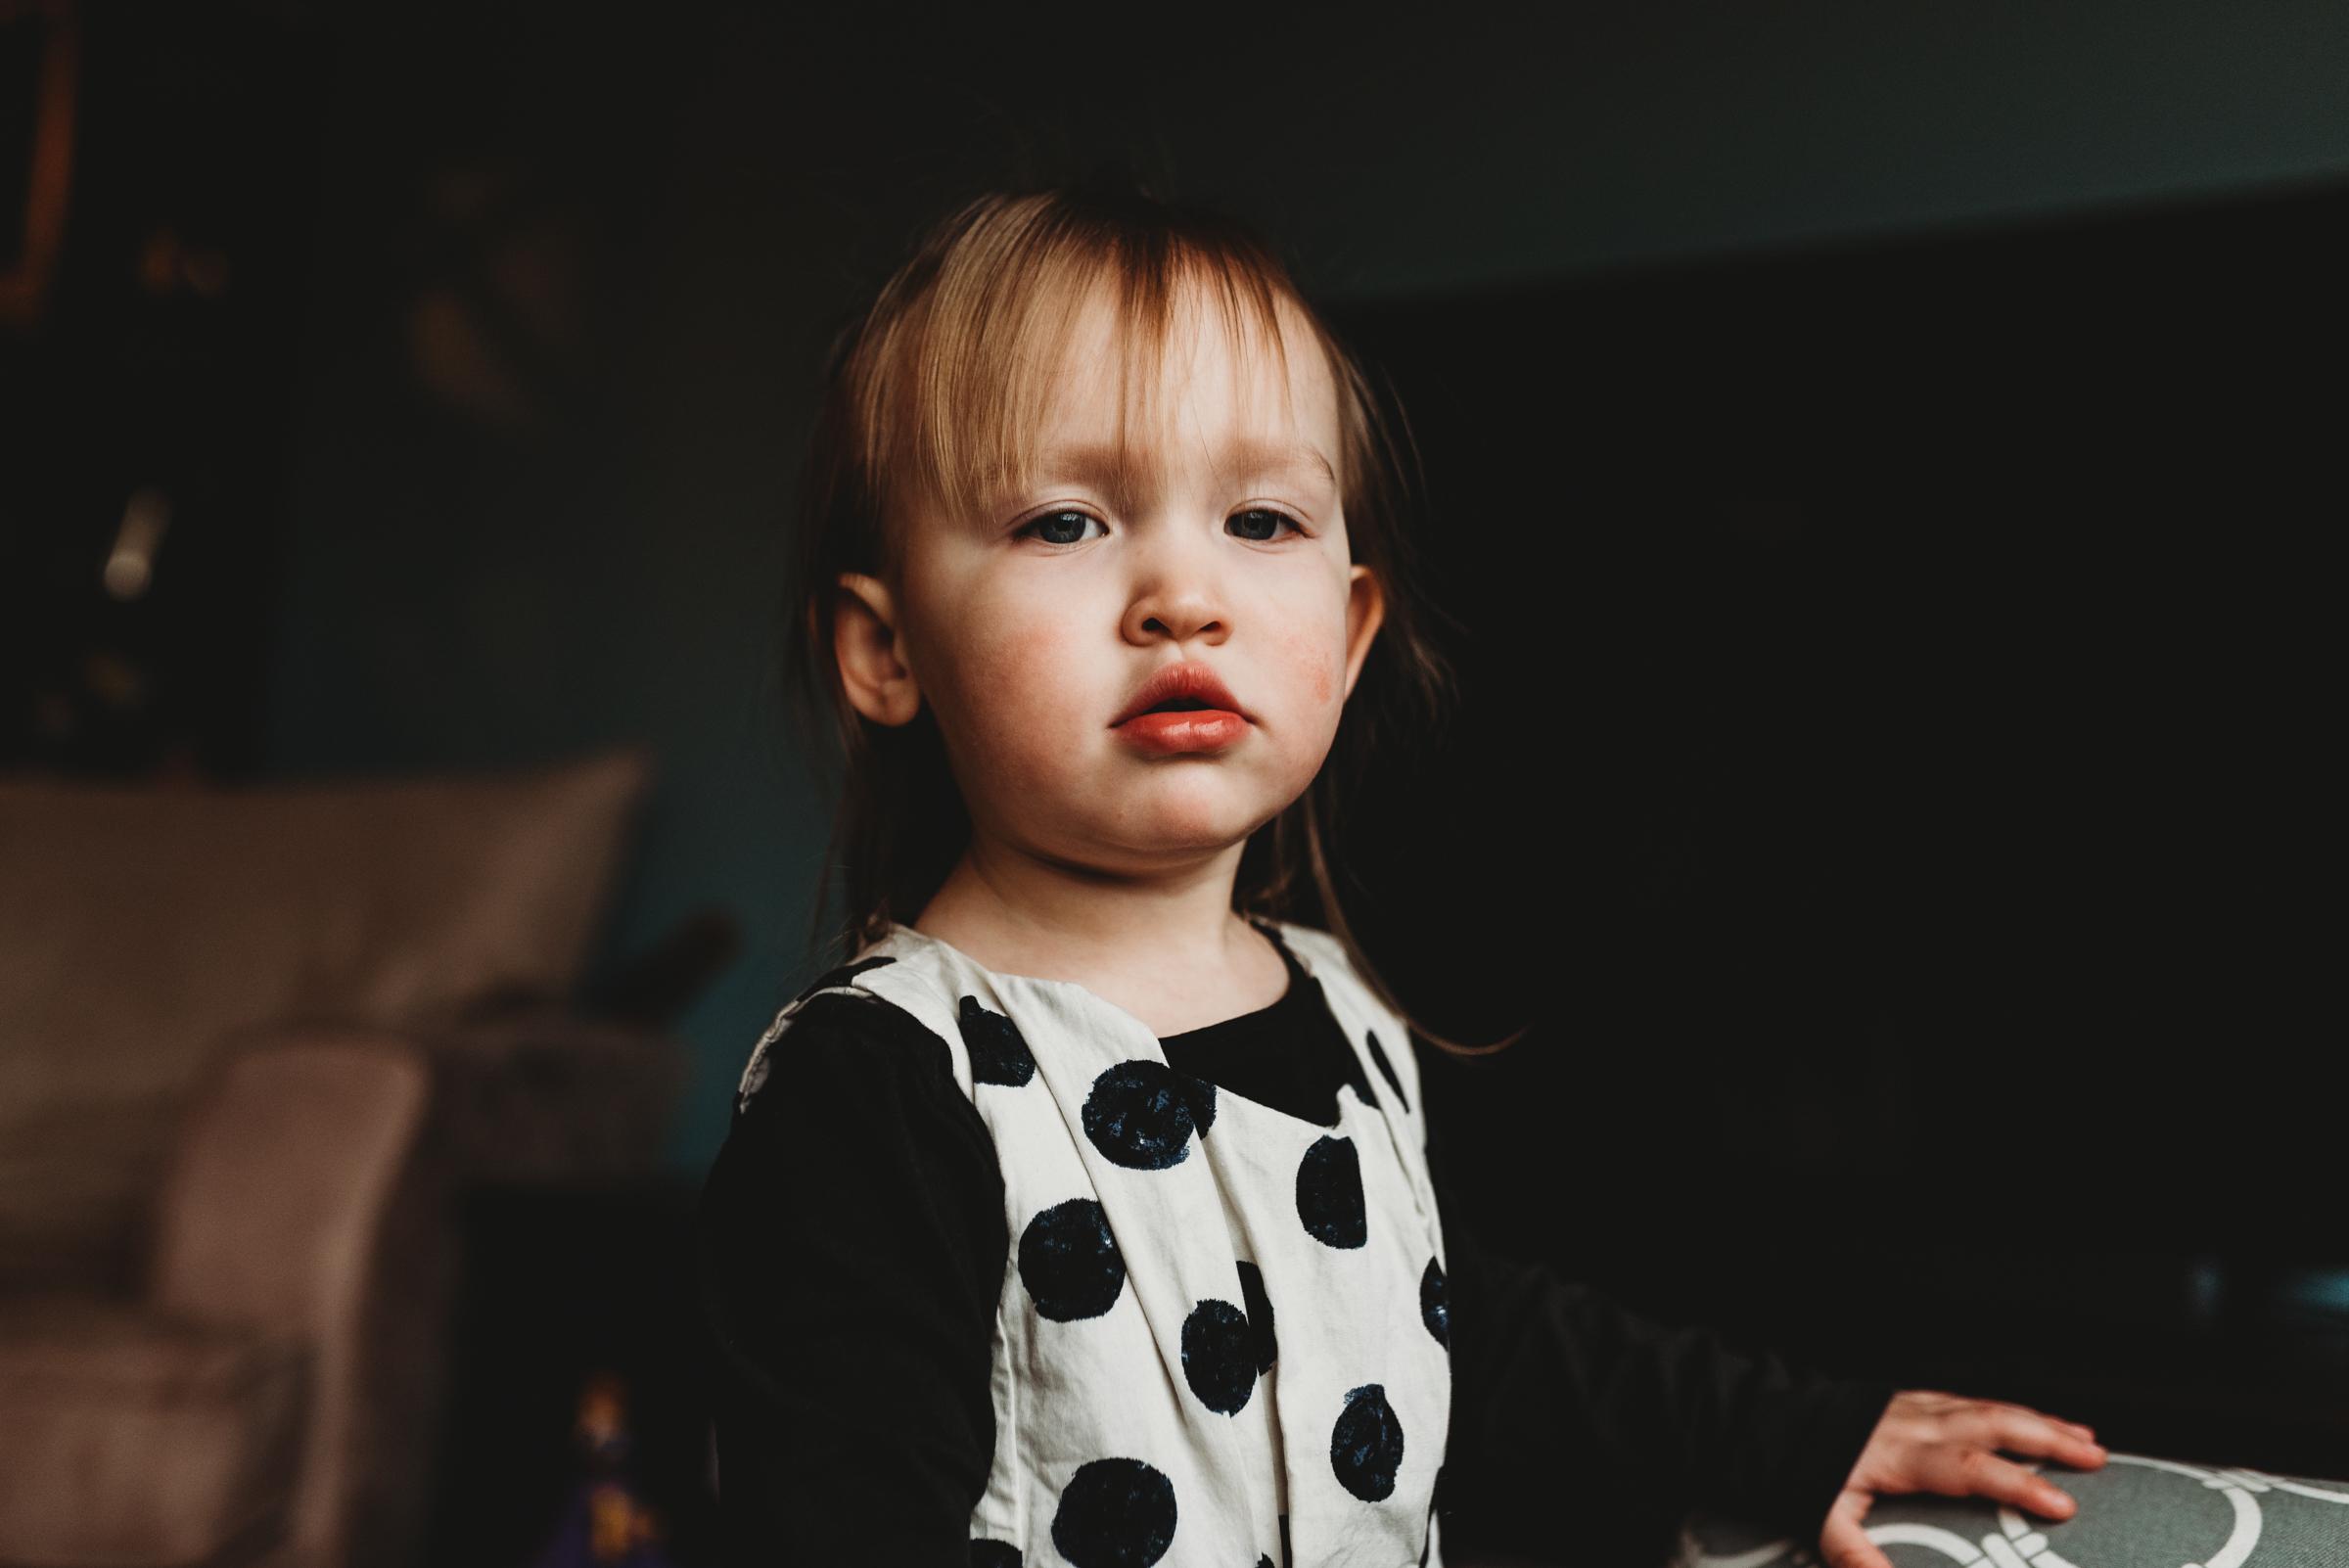 Nicola_Reiersen_Photography_Victoria_BC-49.jpg